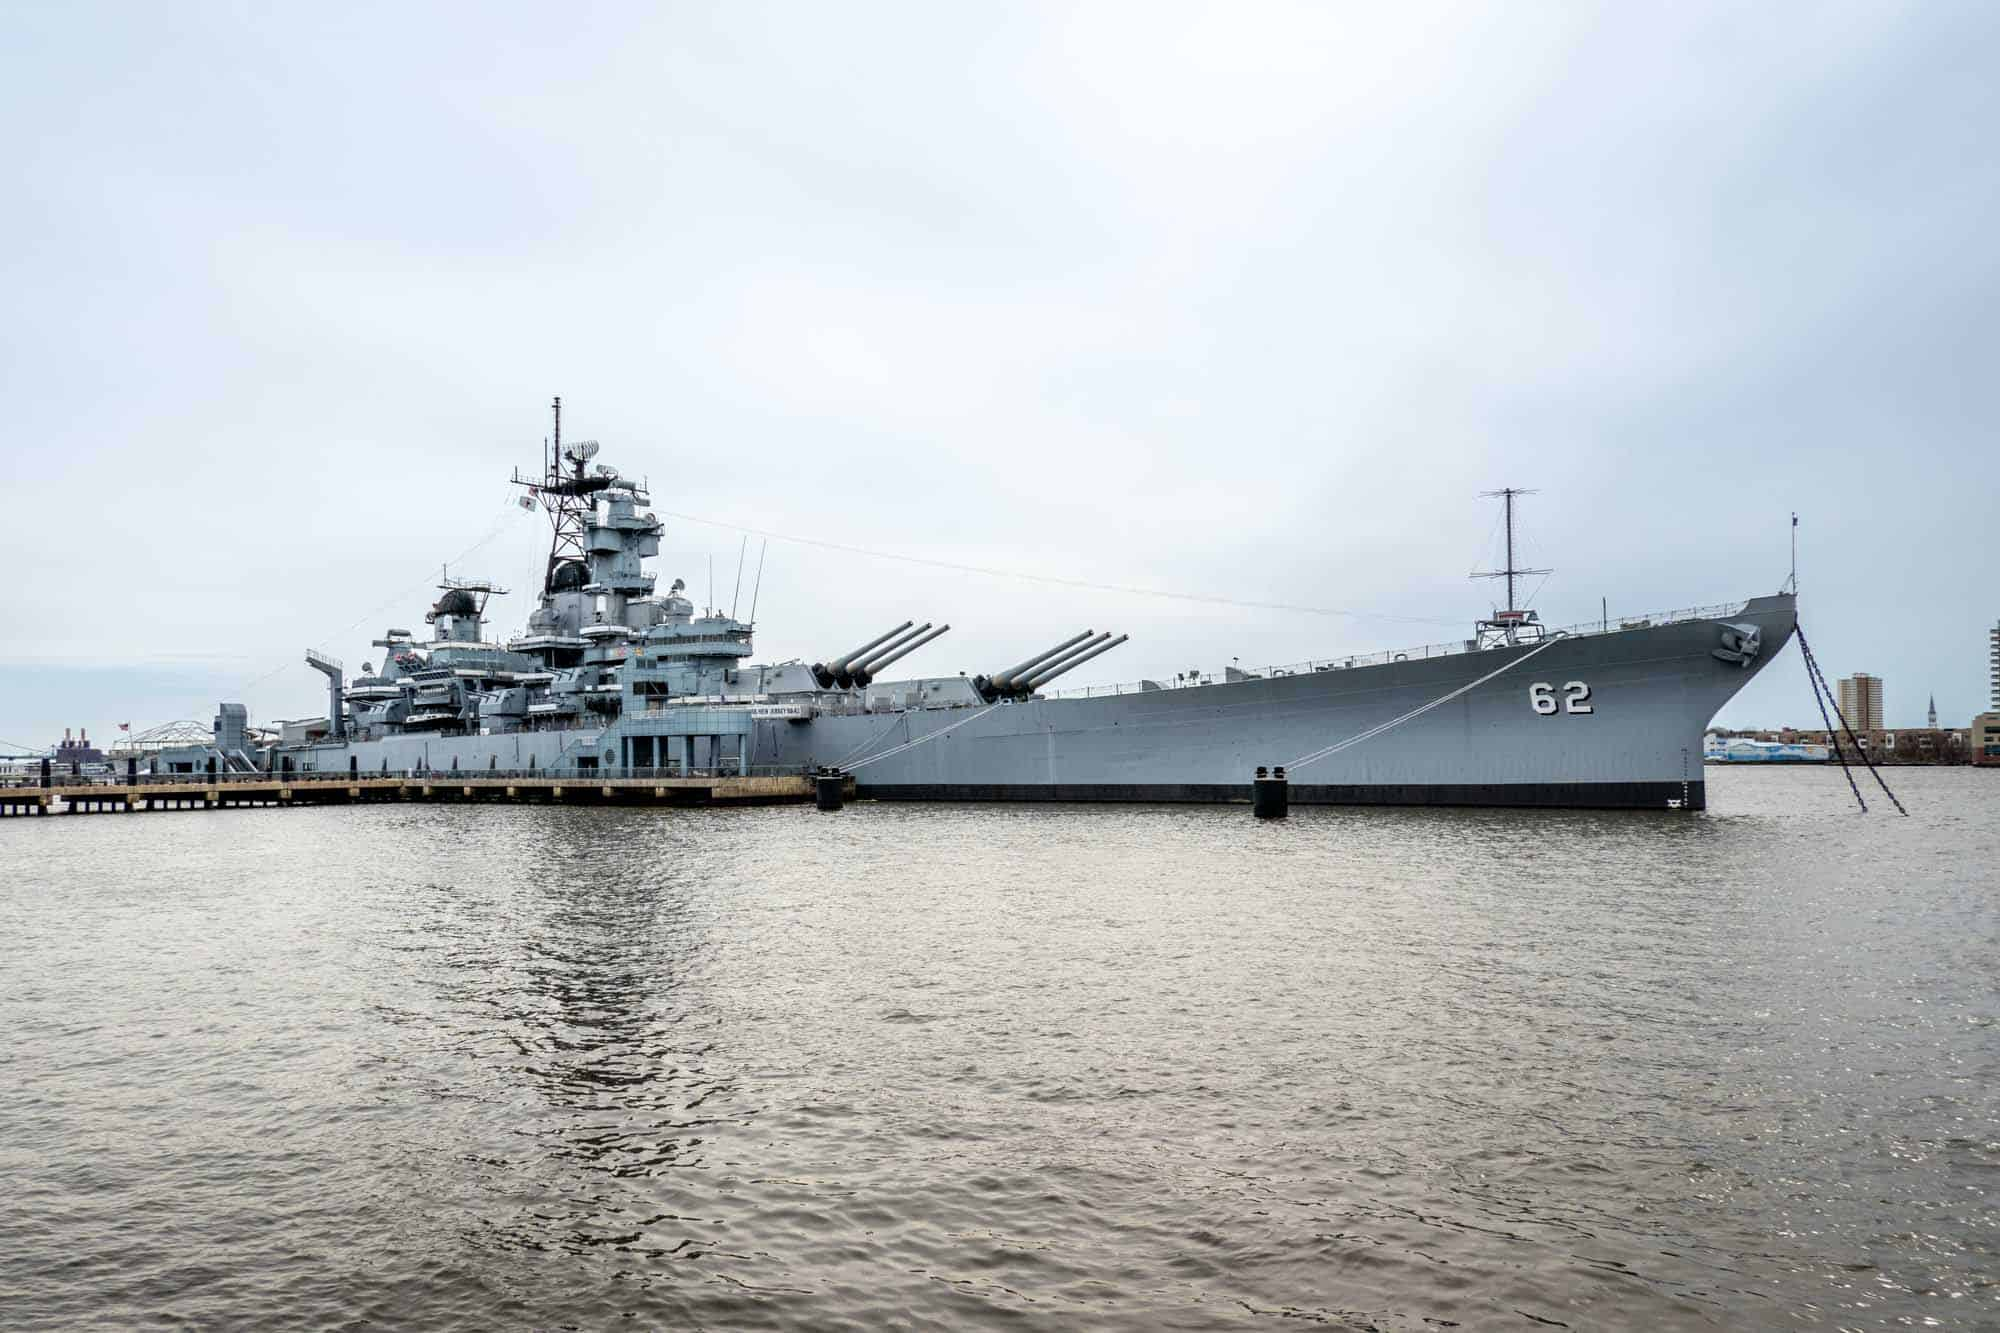 Battleship in the river